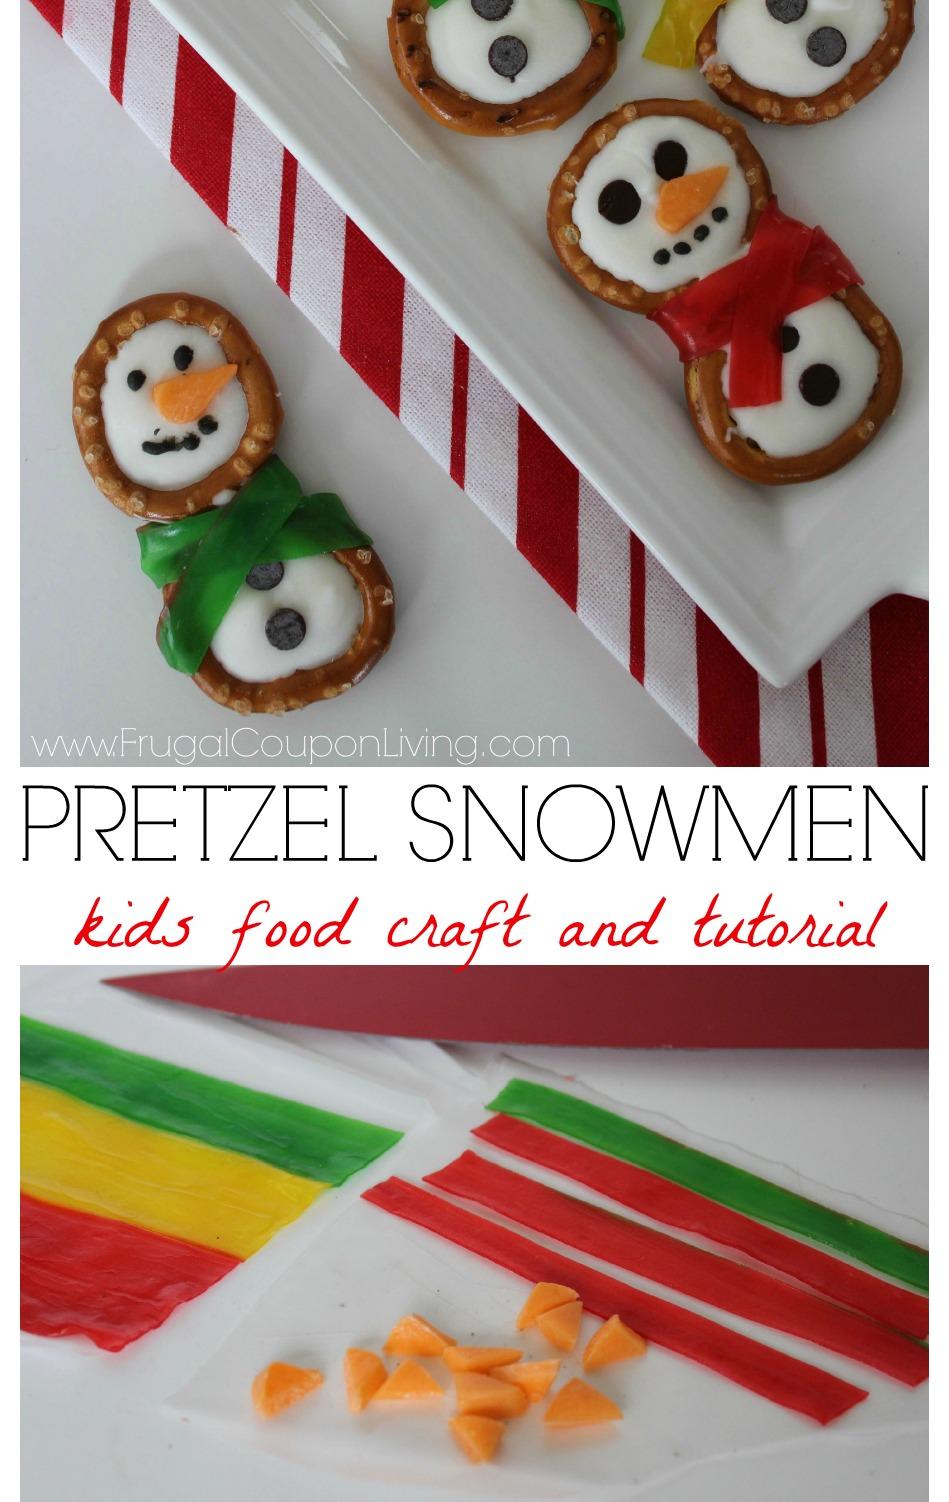 pretzel-snowmen-frugal-coupon-living-2